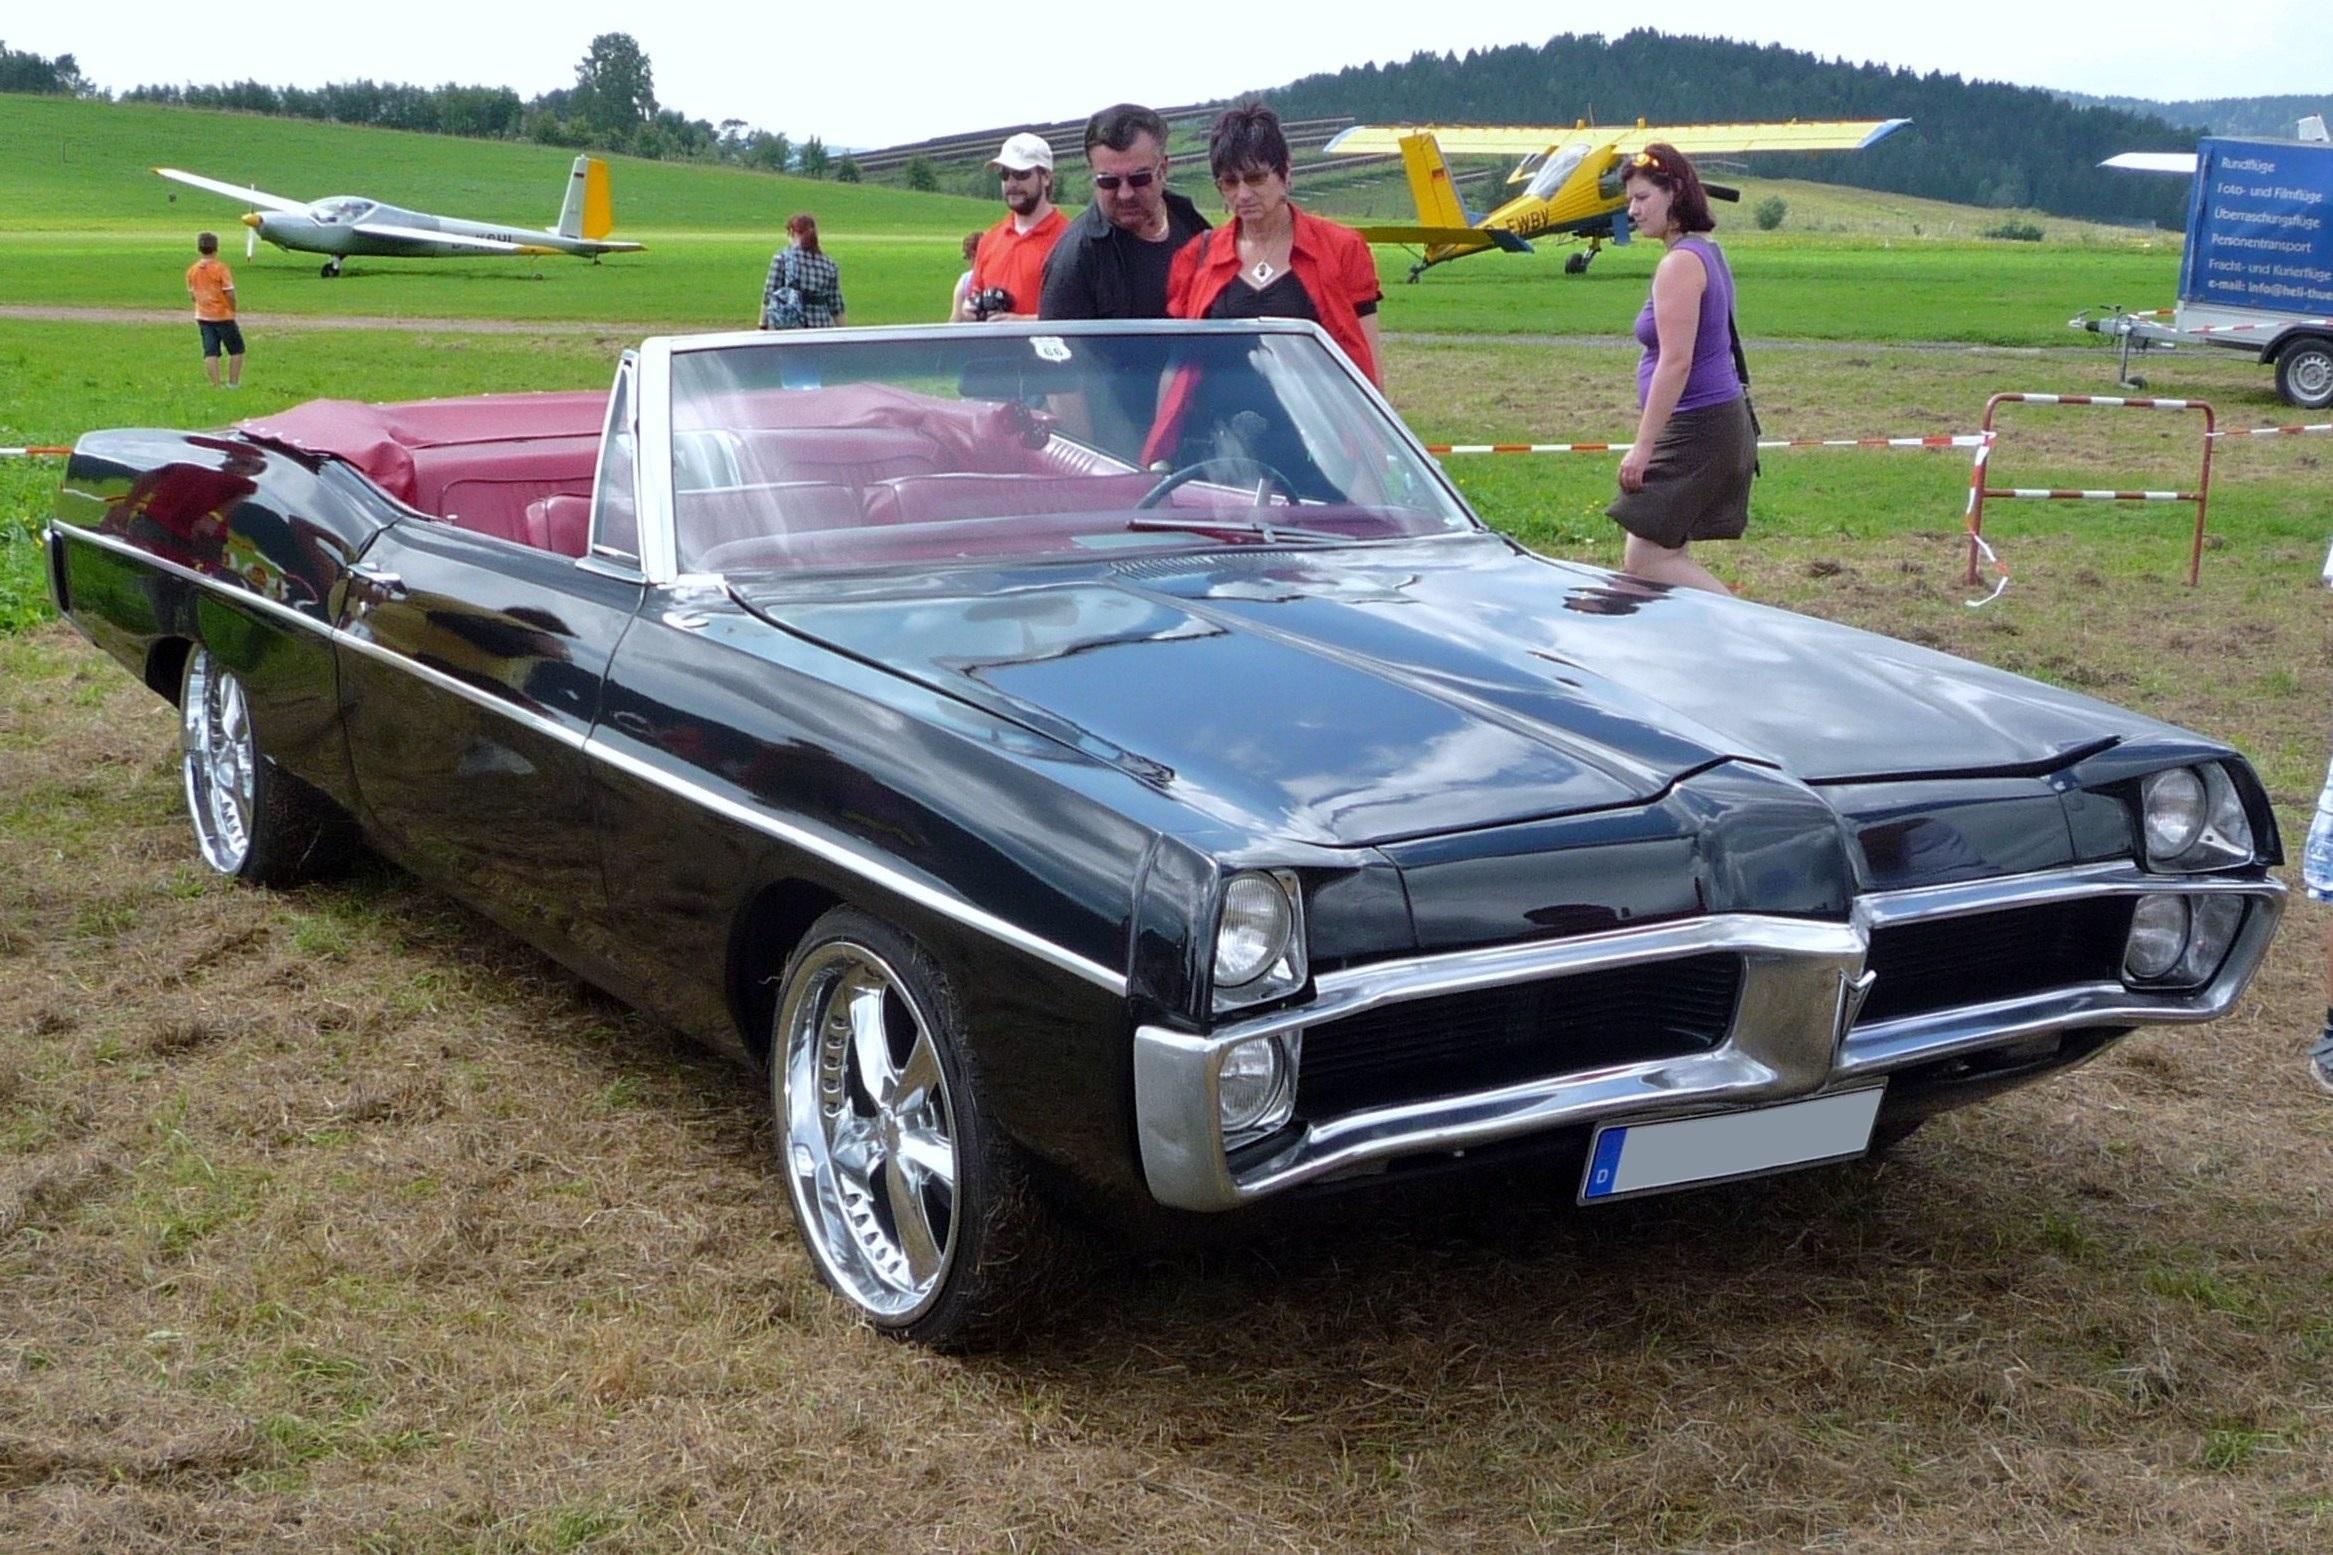 Monroe La Auto Parts Craigslist - fuel-economy info